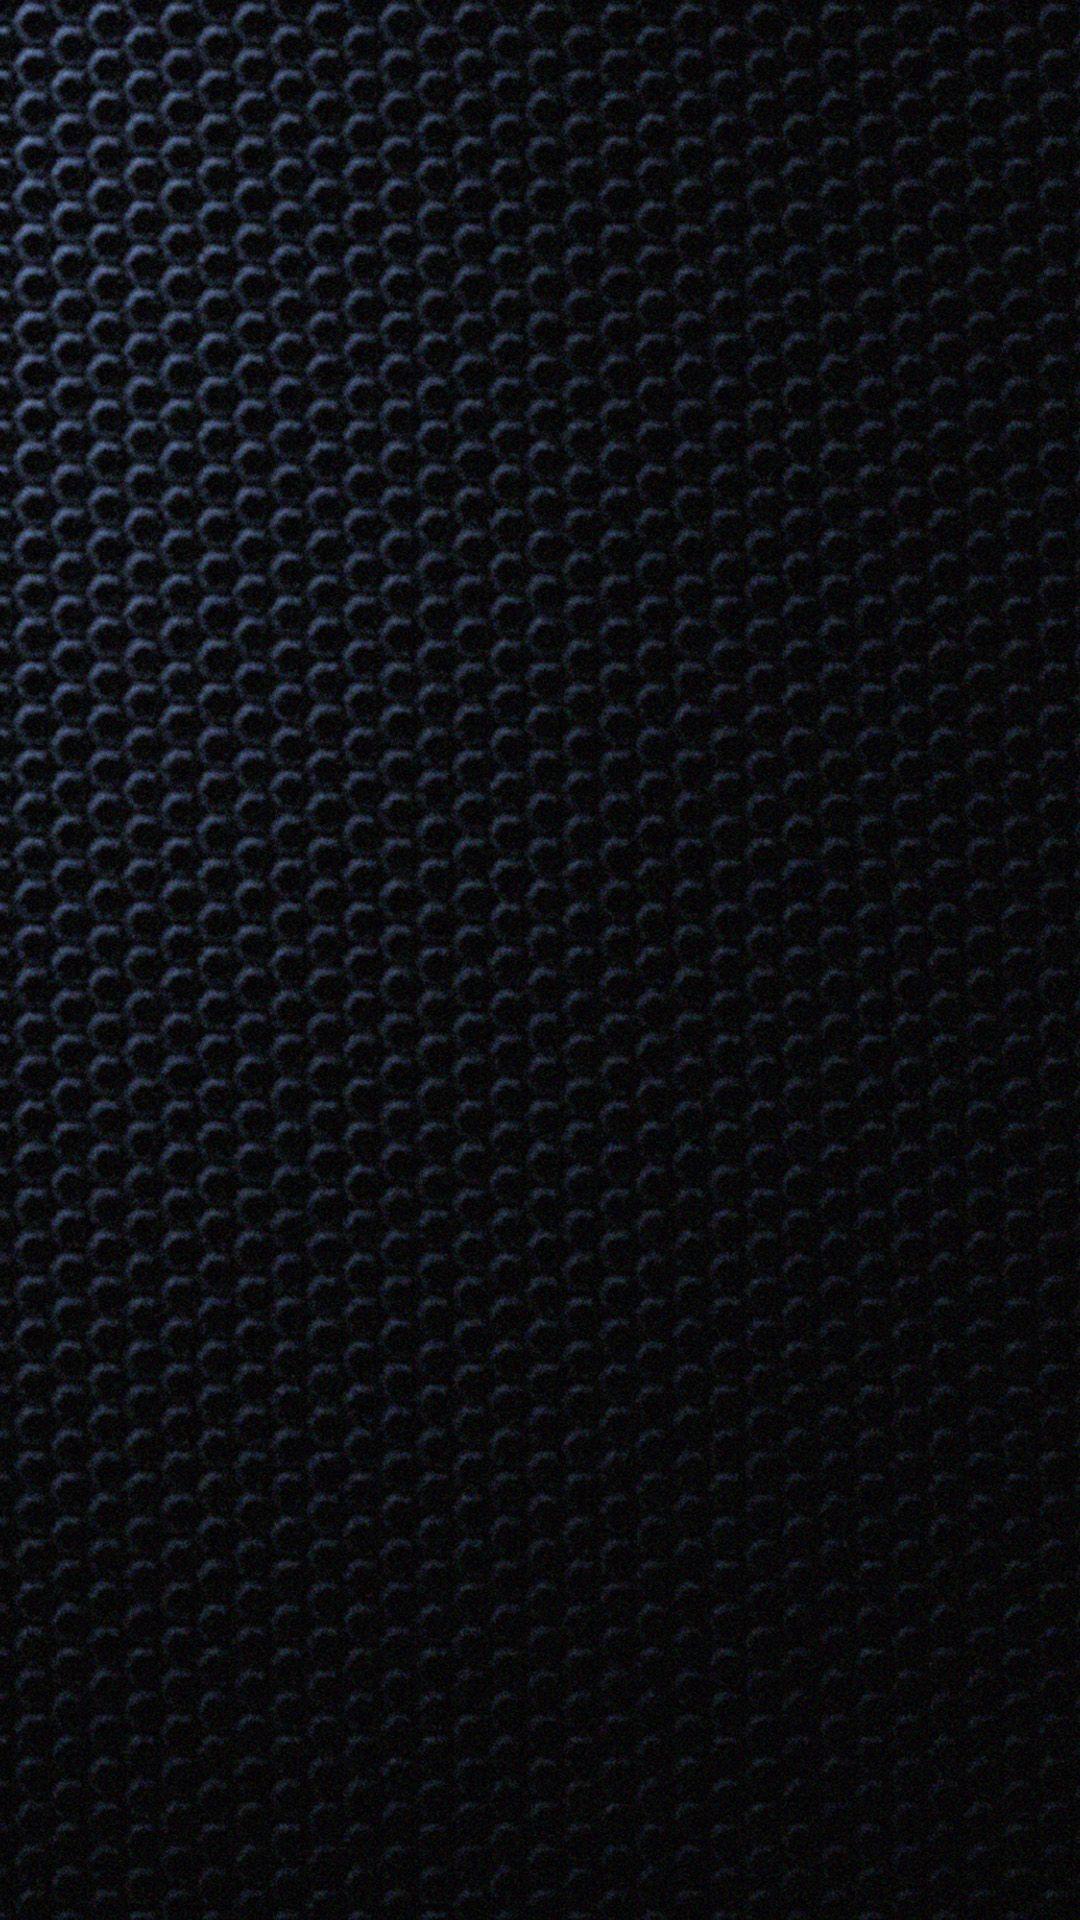 Dark Samsung Wallpapers Top Free Dark Samsung Backgrounds Wallpaperaccess